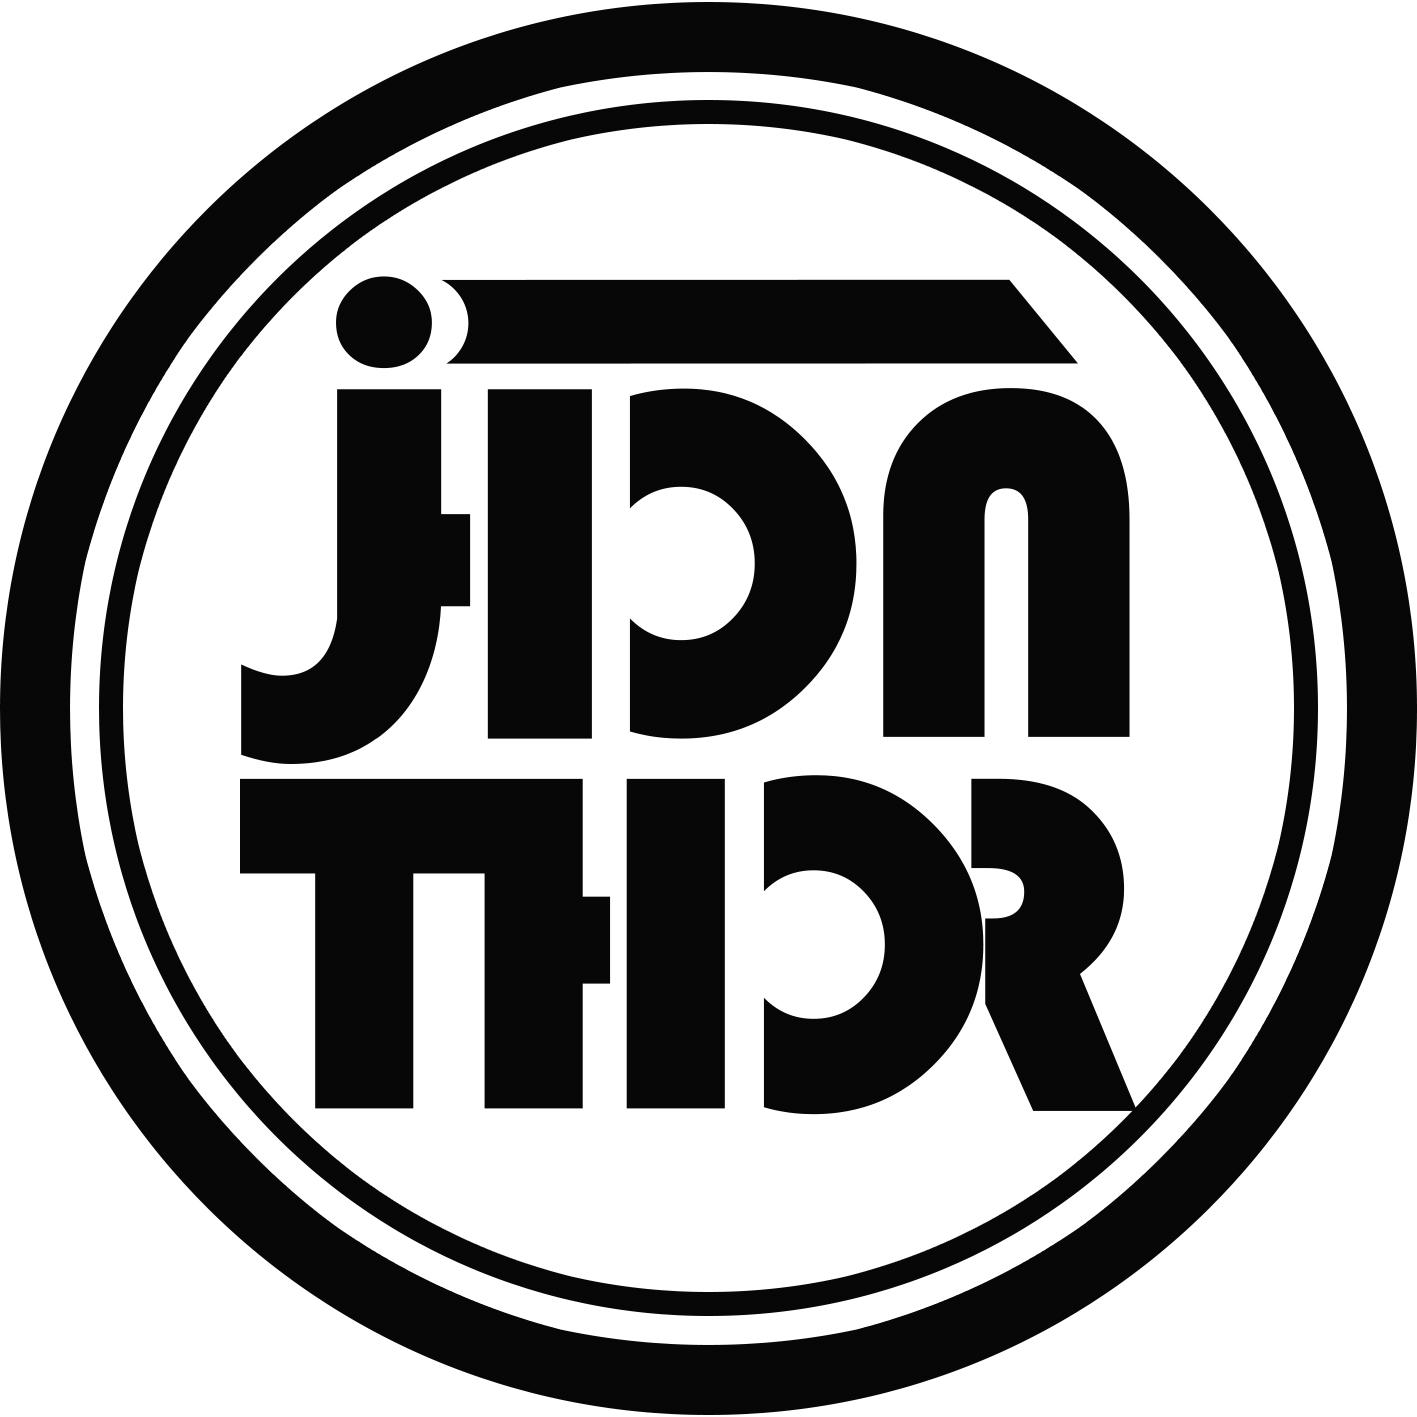 Jhon Thor Graphics